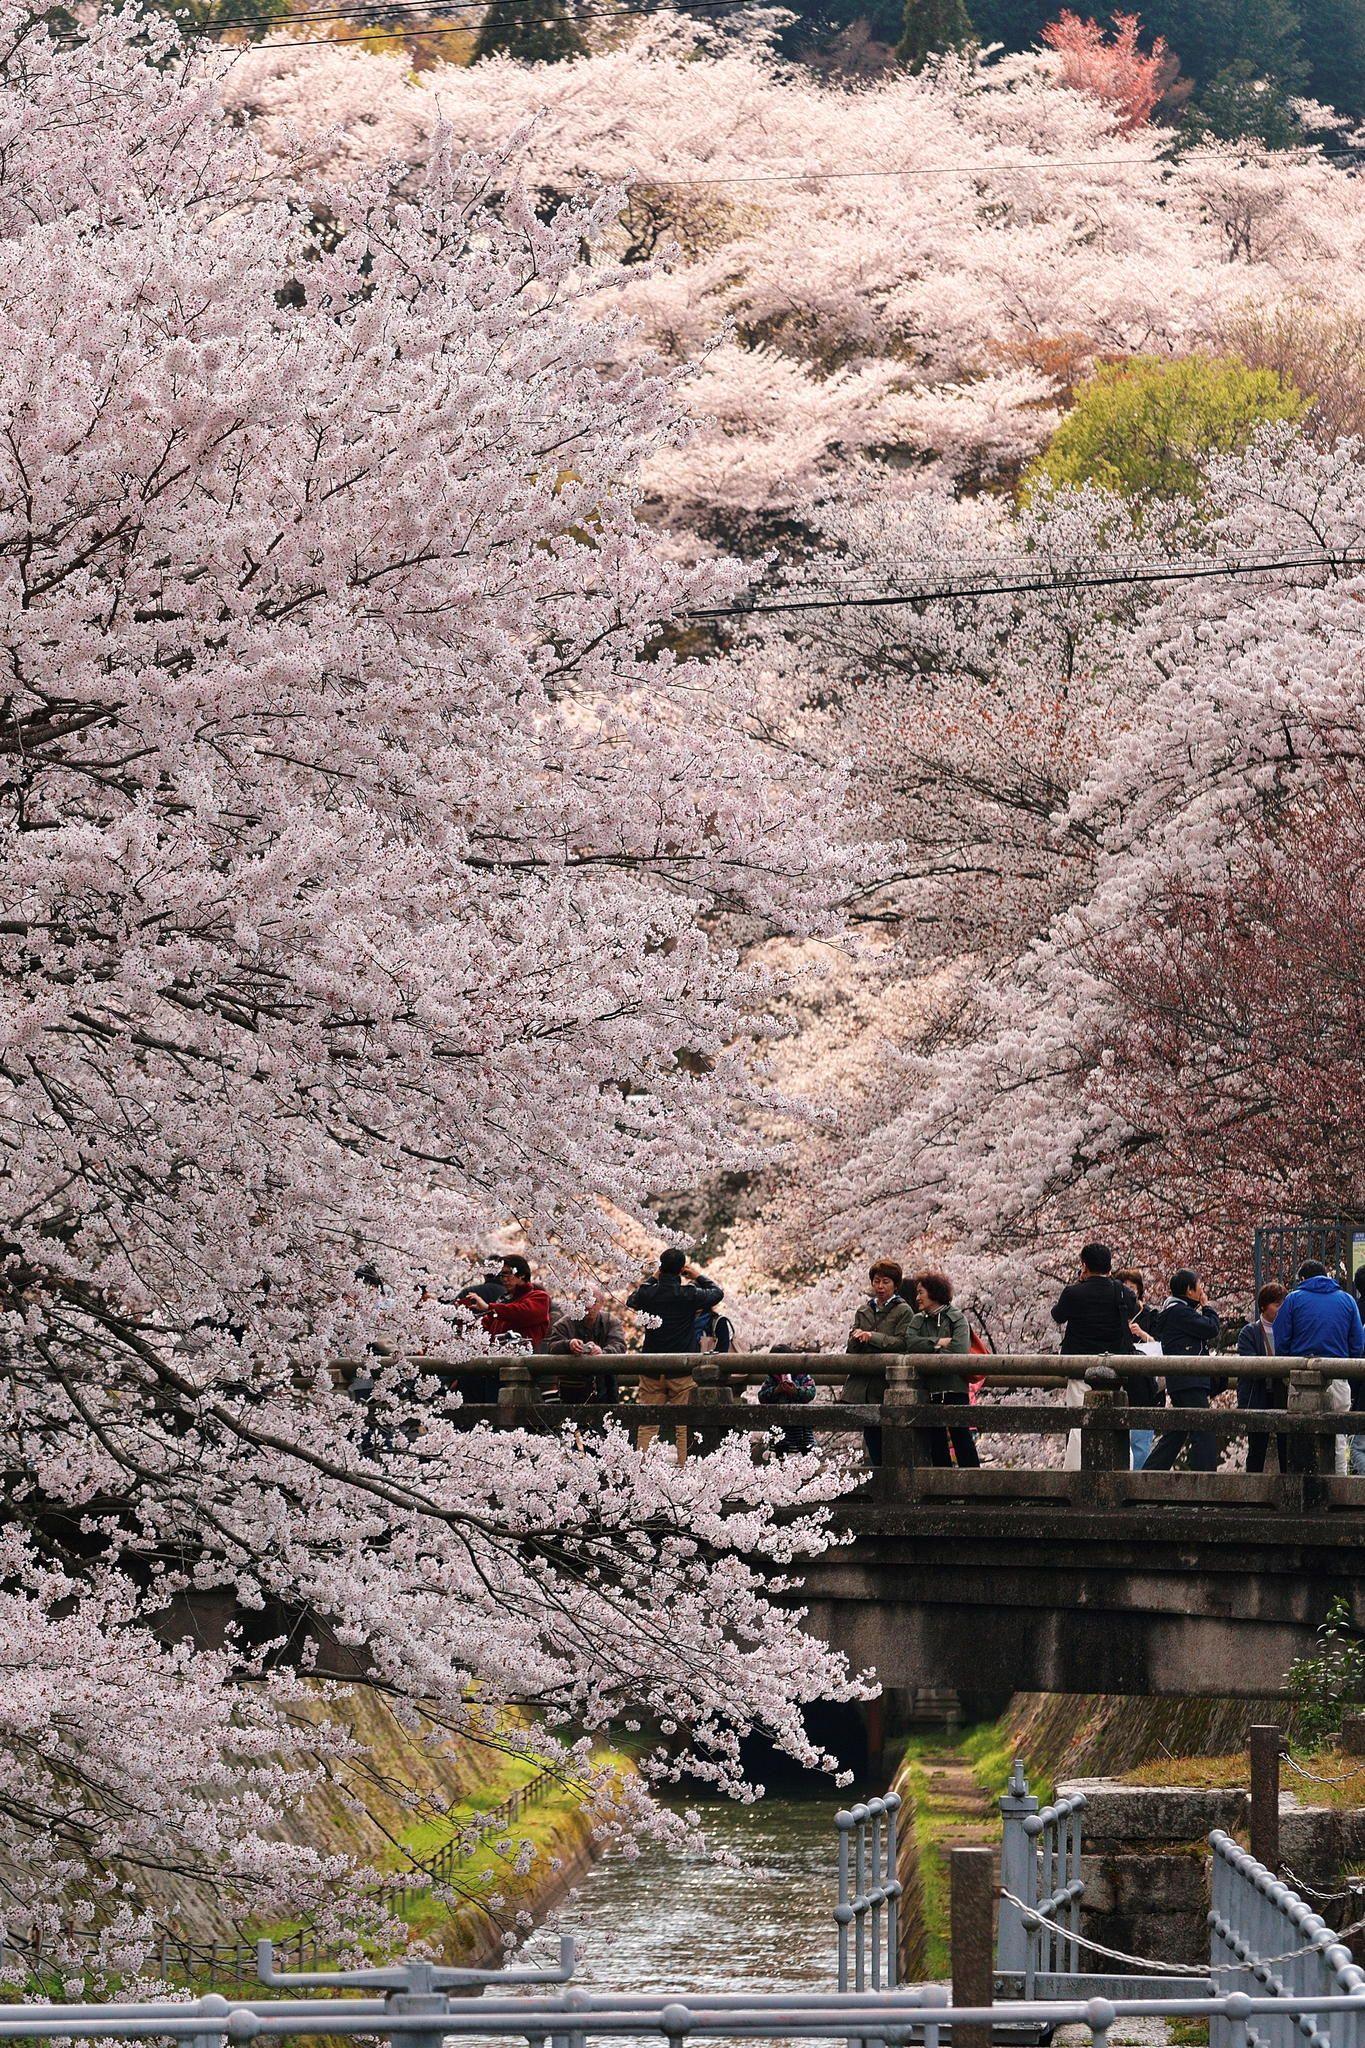 Cherry Blossoms Cherry Blossom Japan Spring Scenery Japan Garden